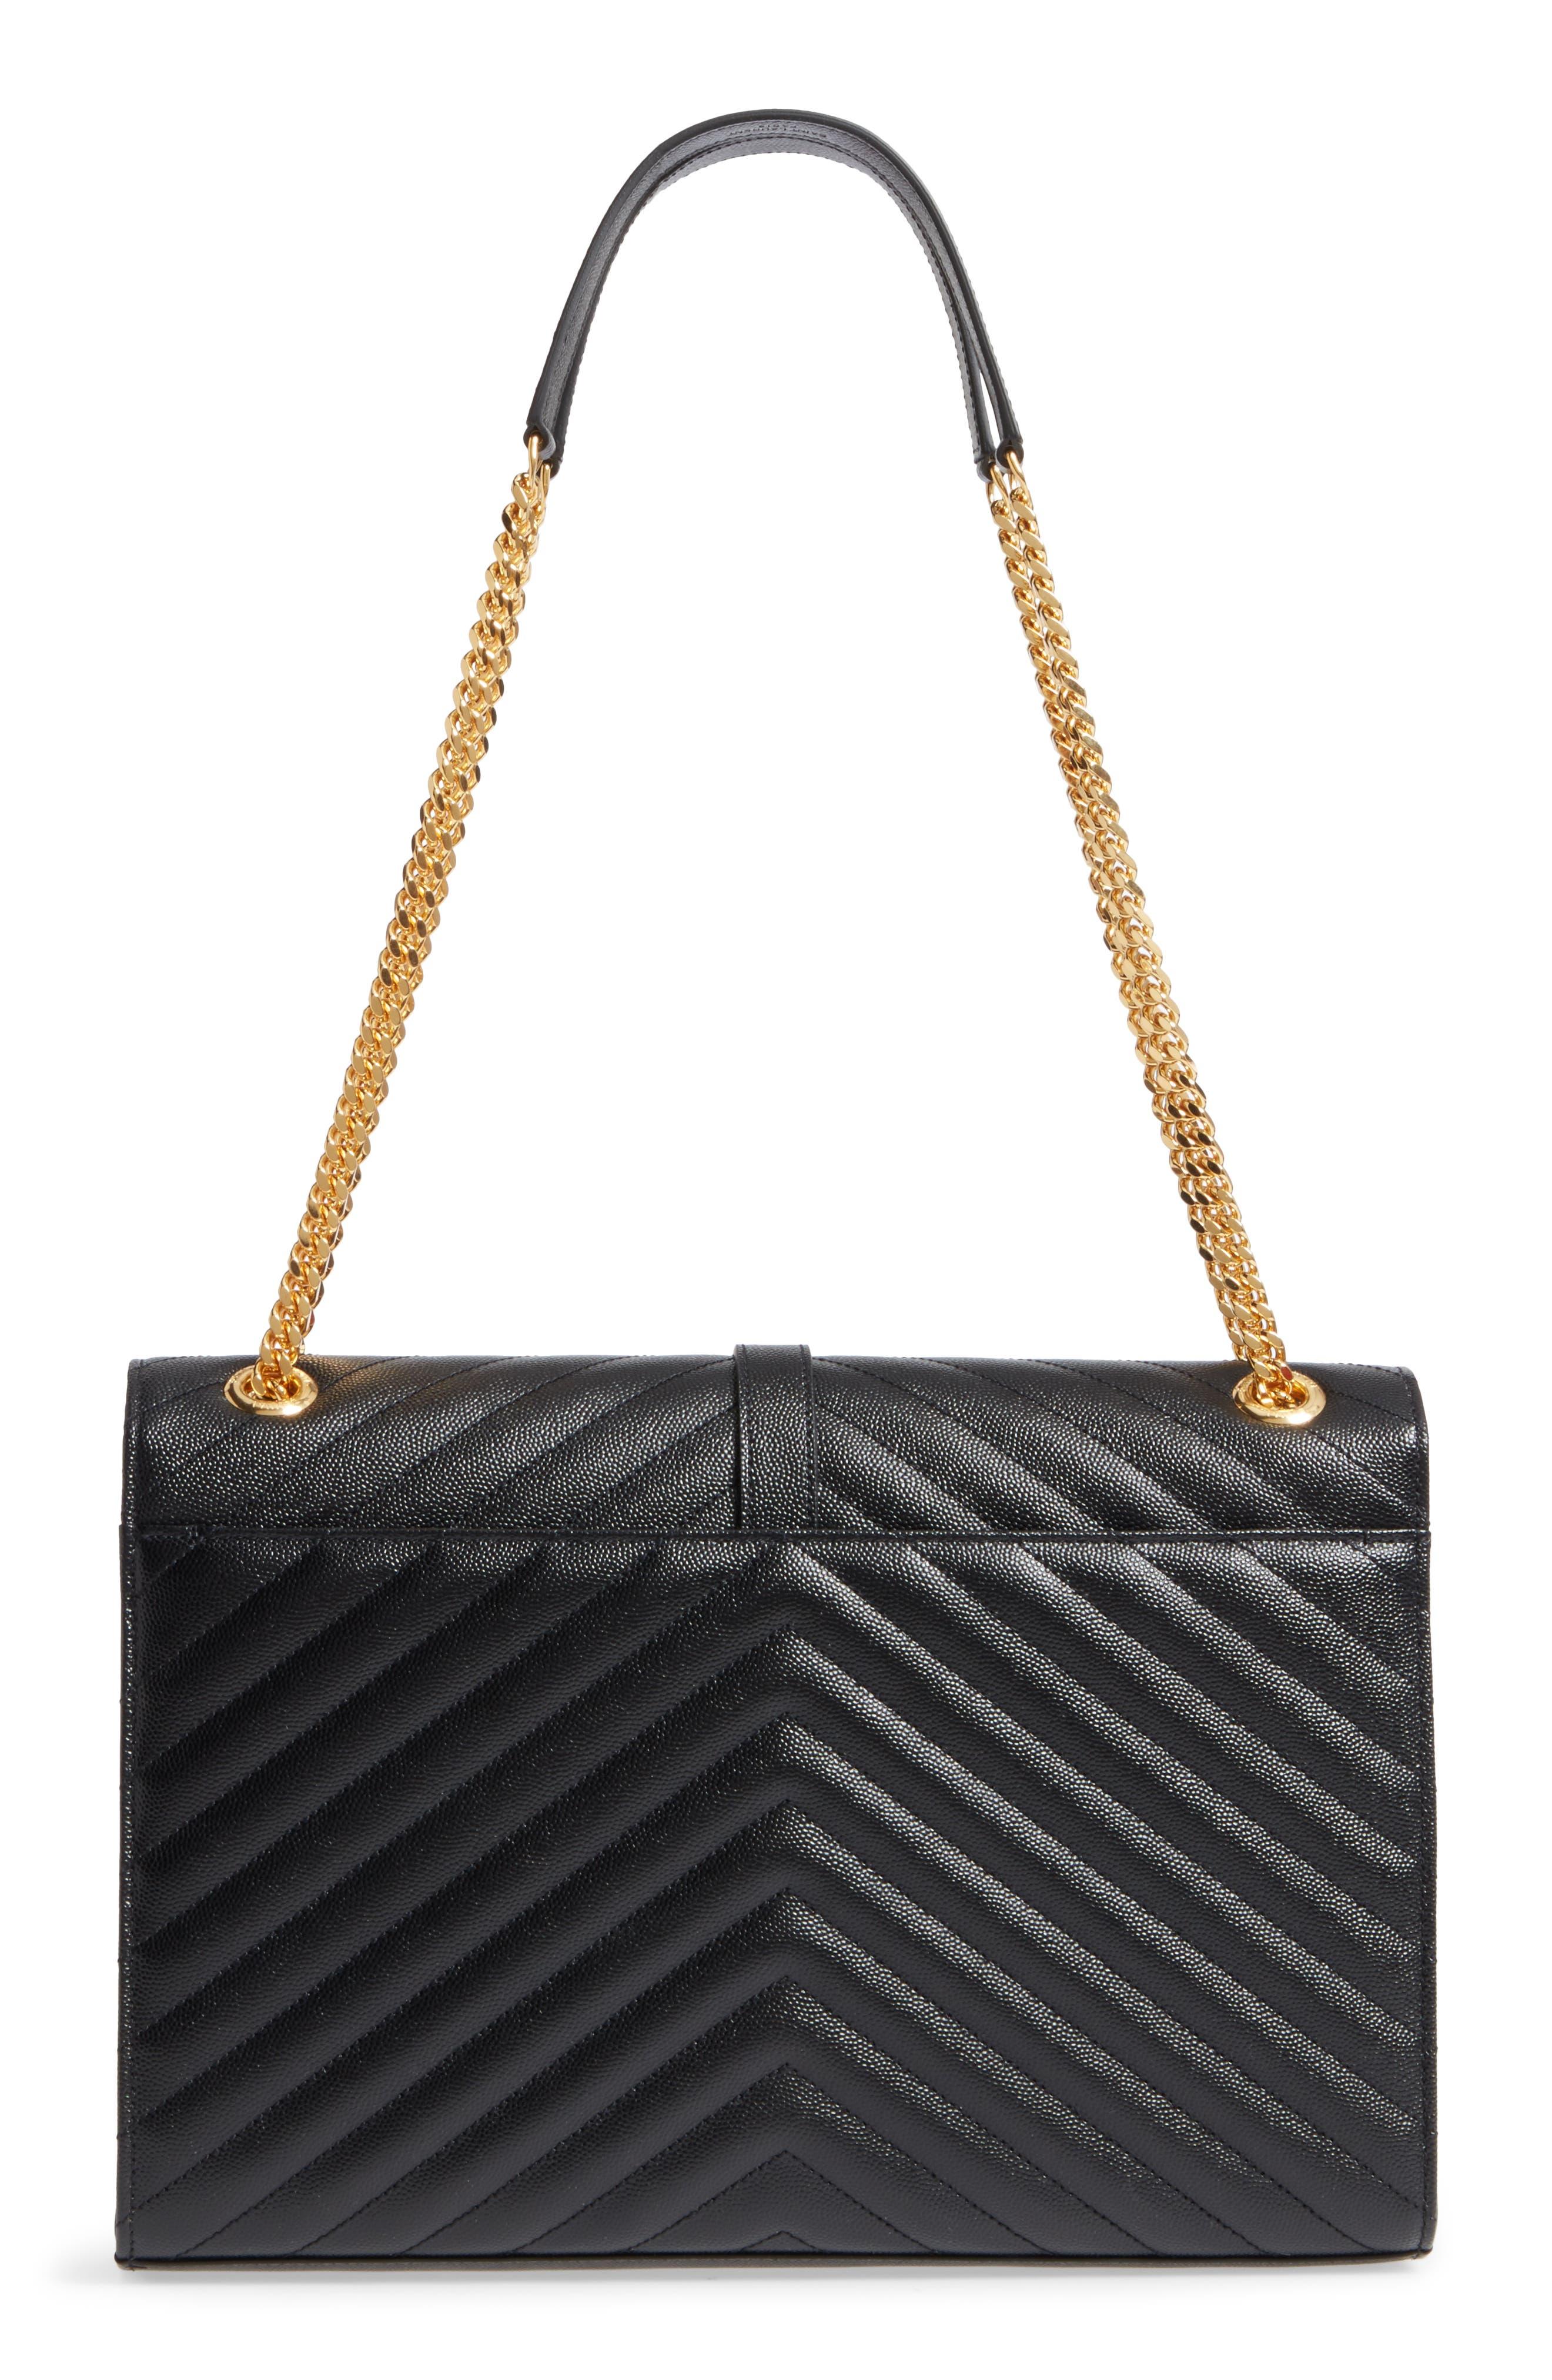 Medium Grained Matelassé Quilted Leather Shoulder Bag,                             Alternate thumbnail 3, color,                             001